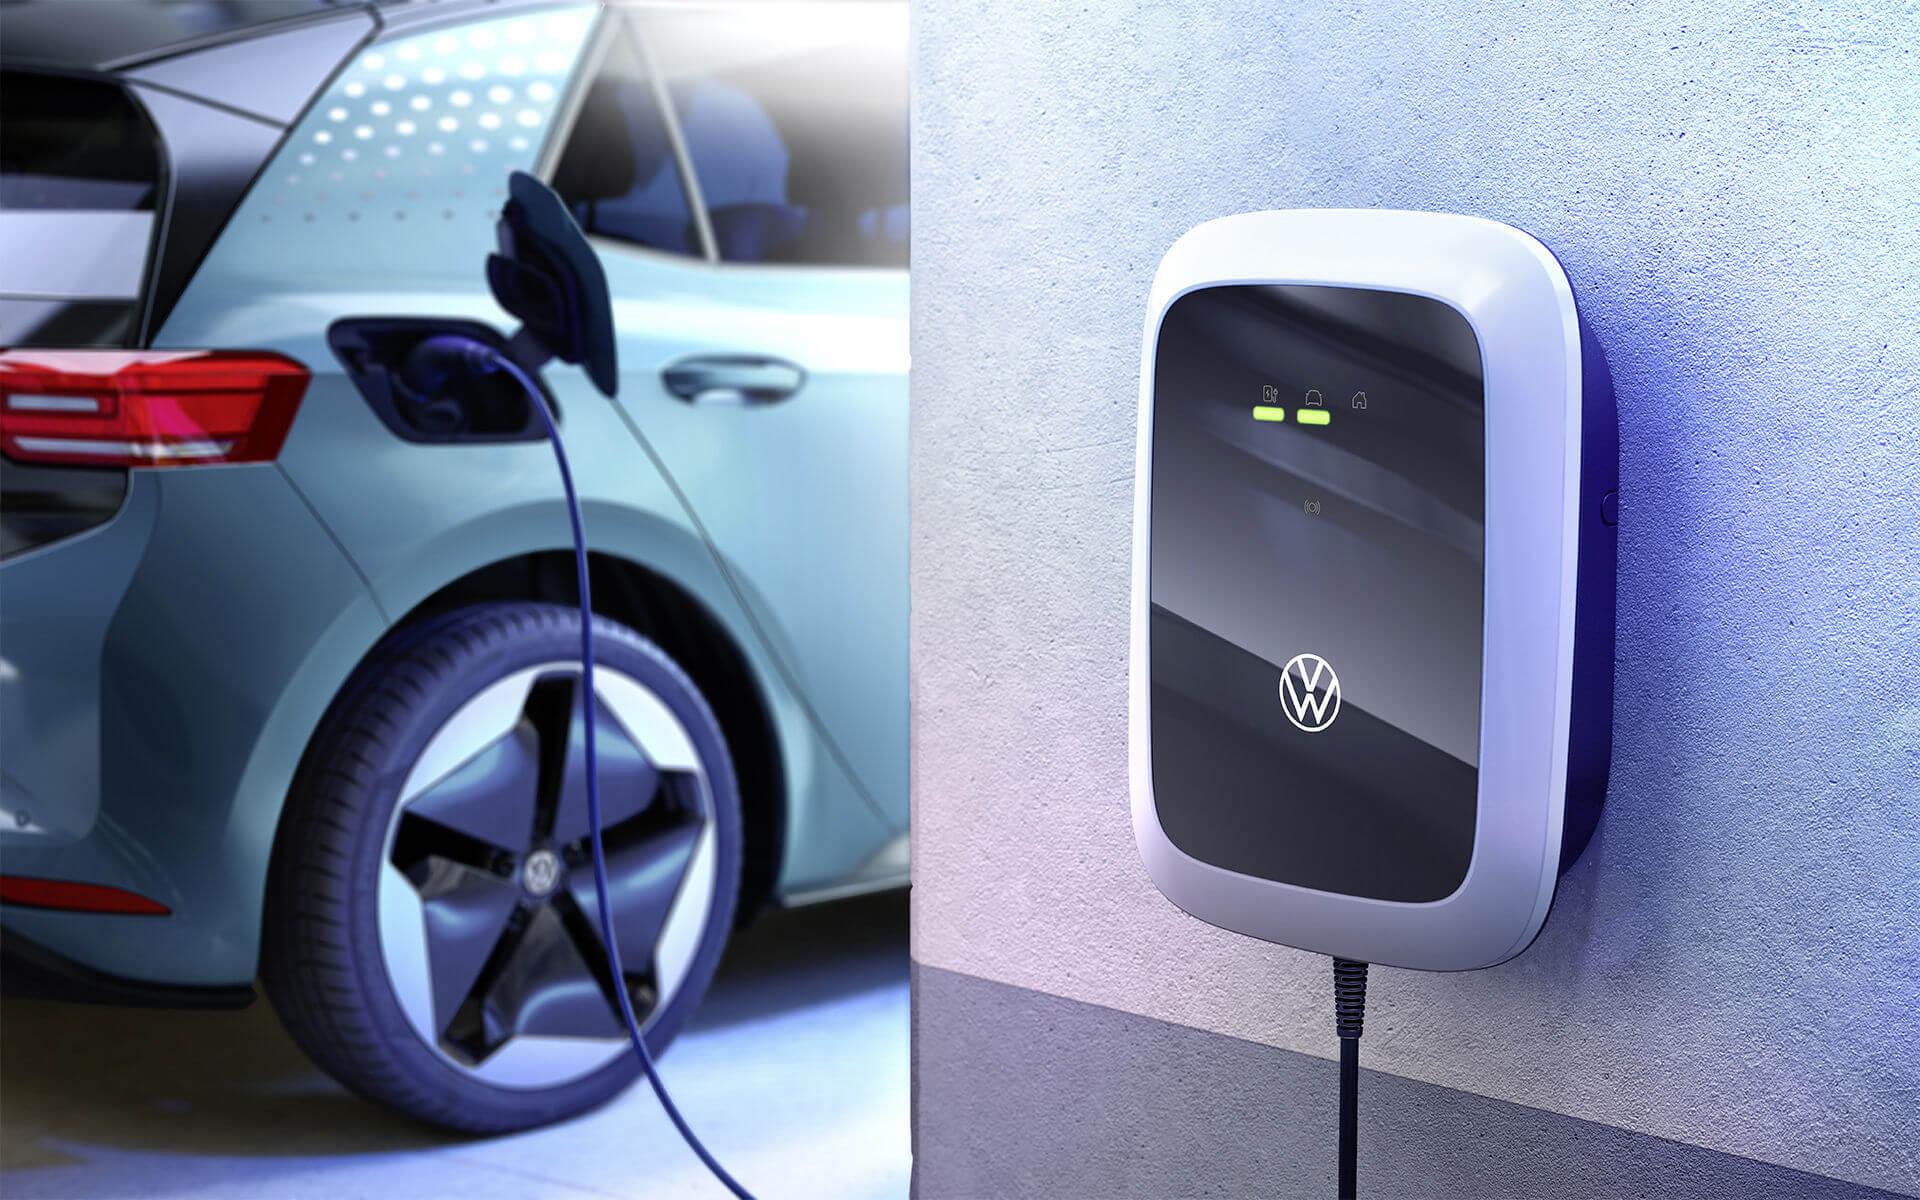 Volkswagen представляет настенную зарядную станцию ID. Charger